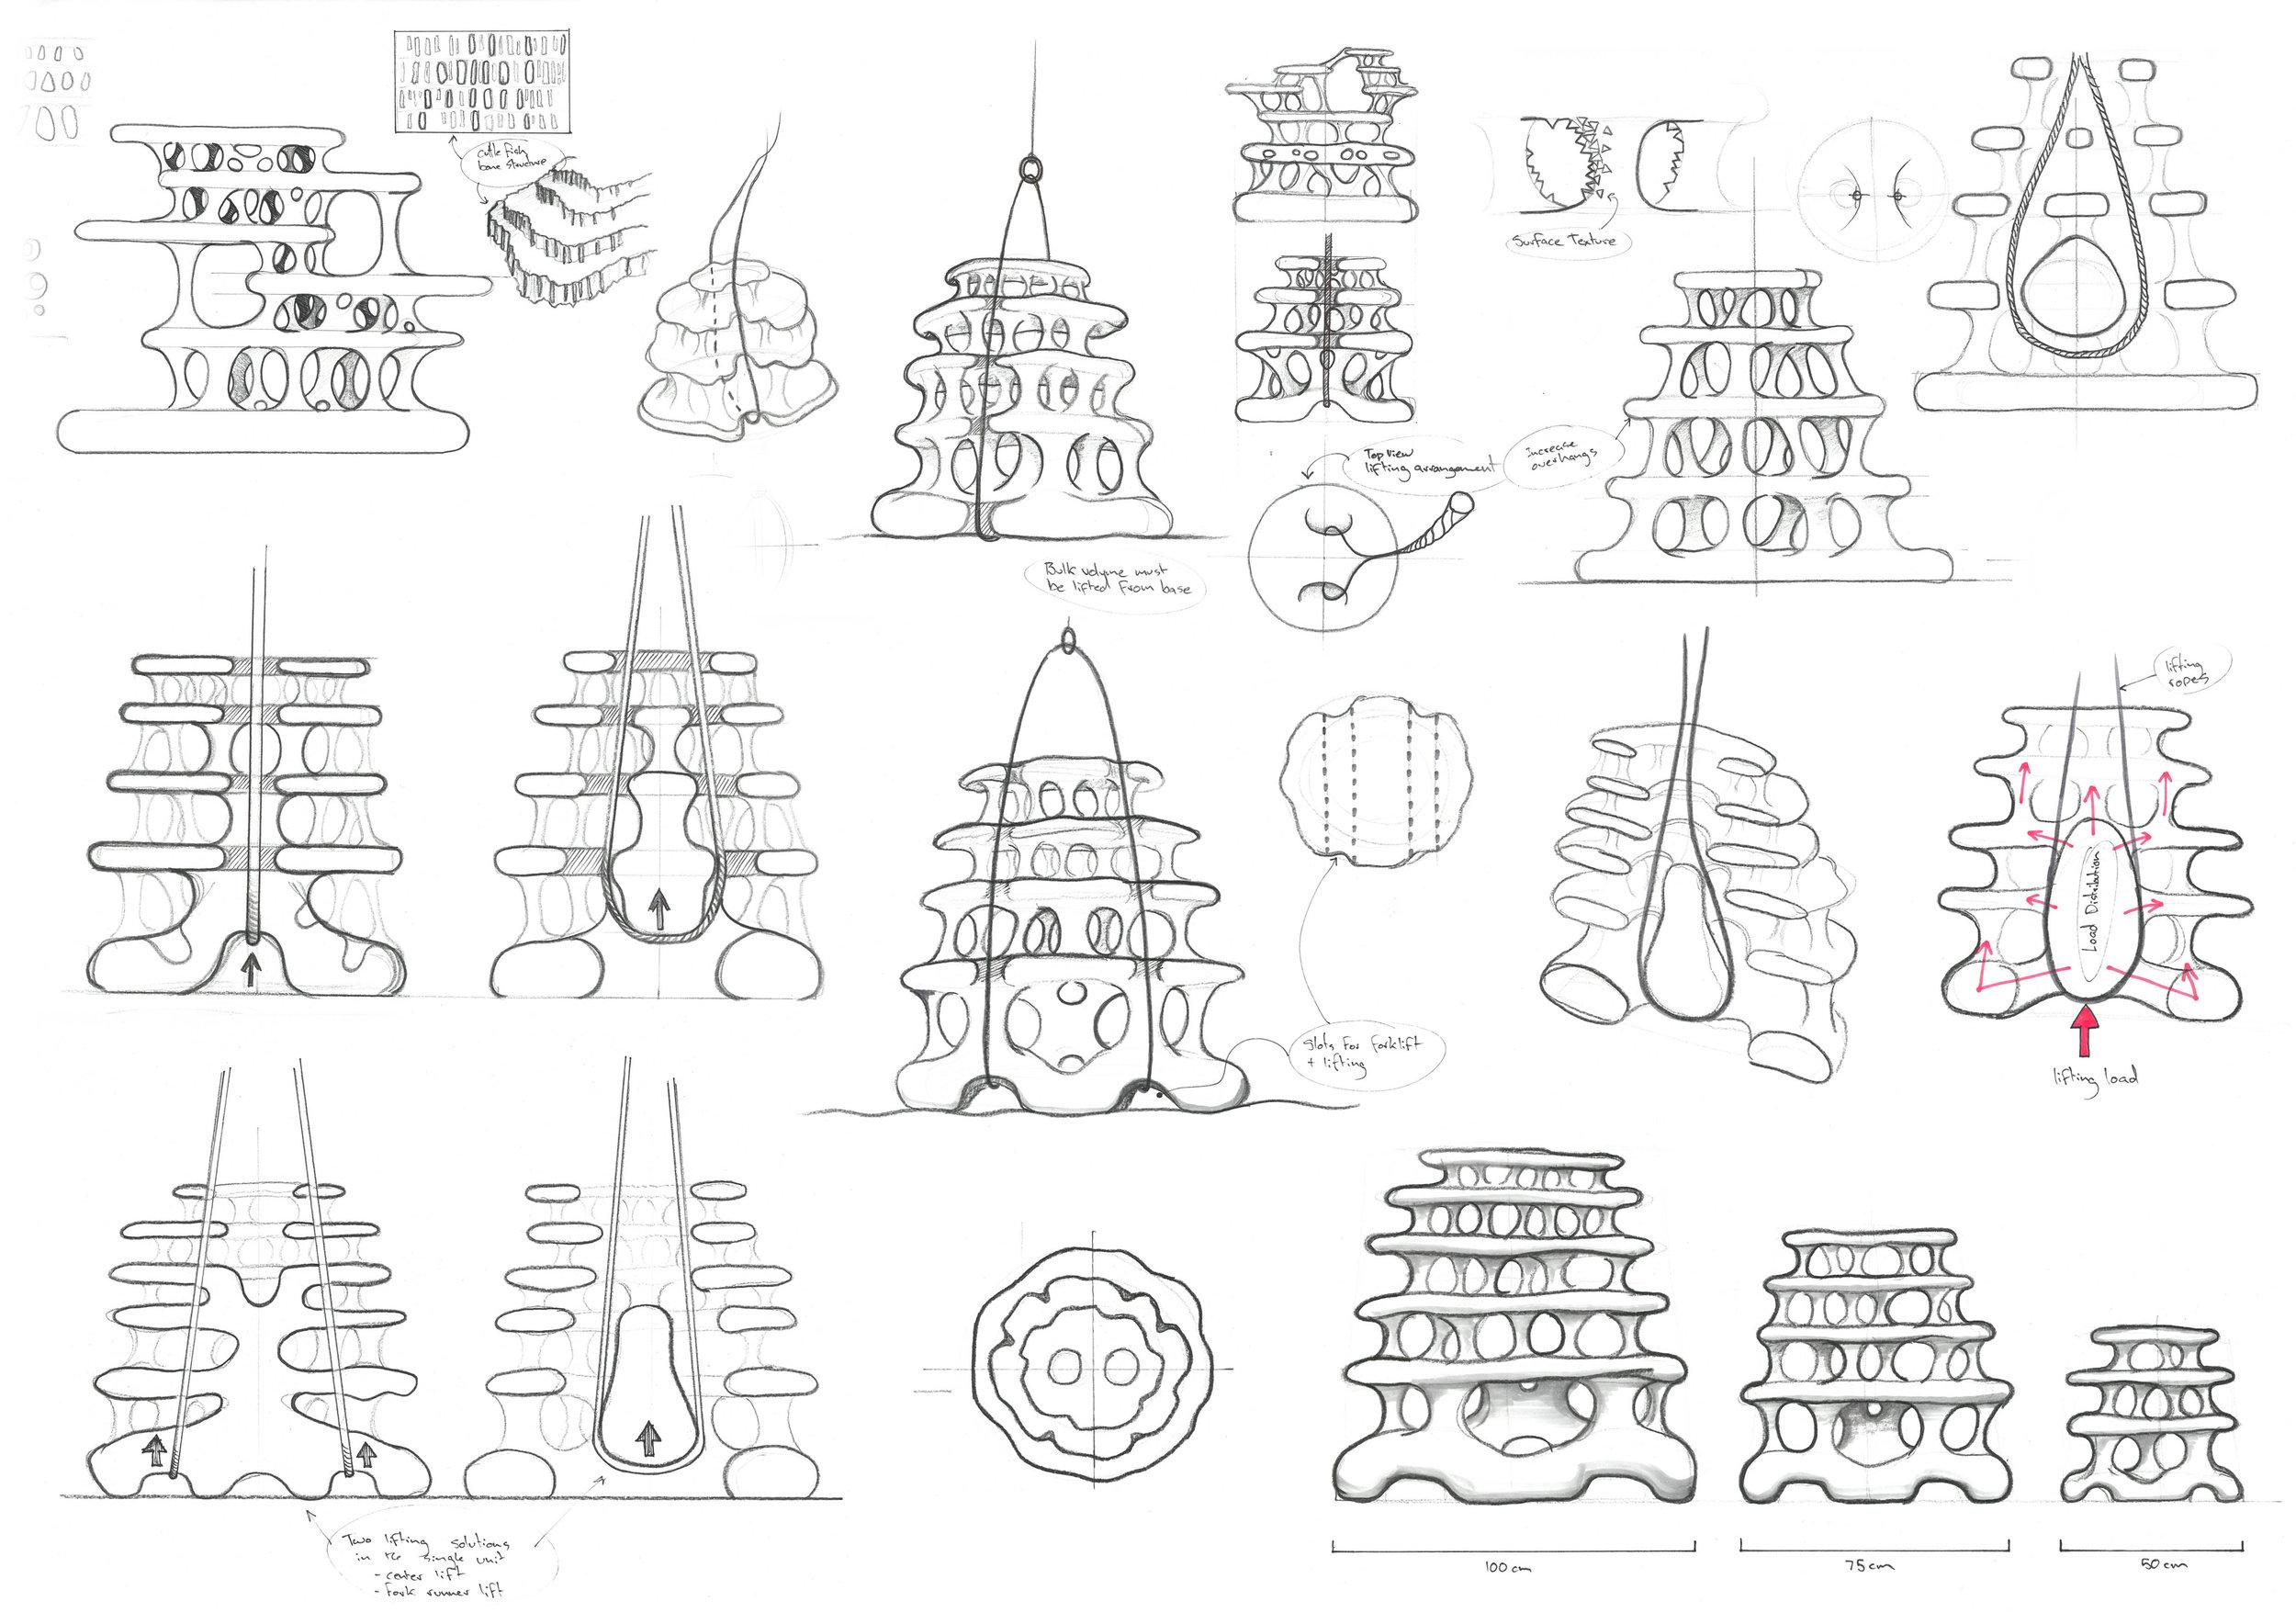 WWF 3D Reef Sketches.Alex.Goad.jpg